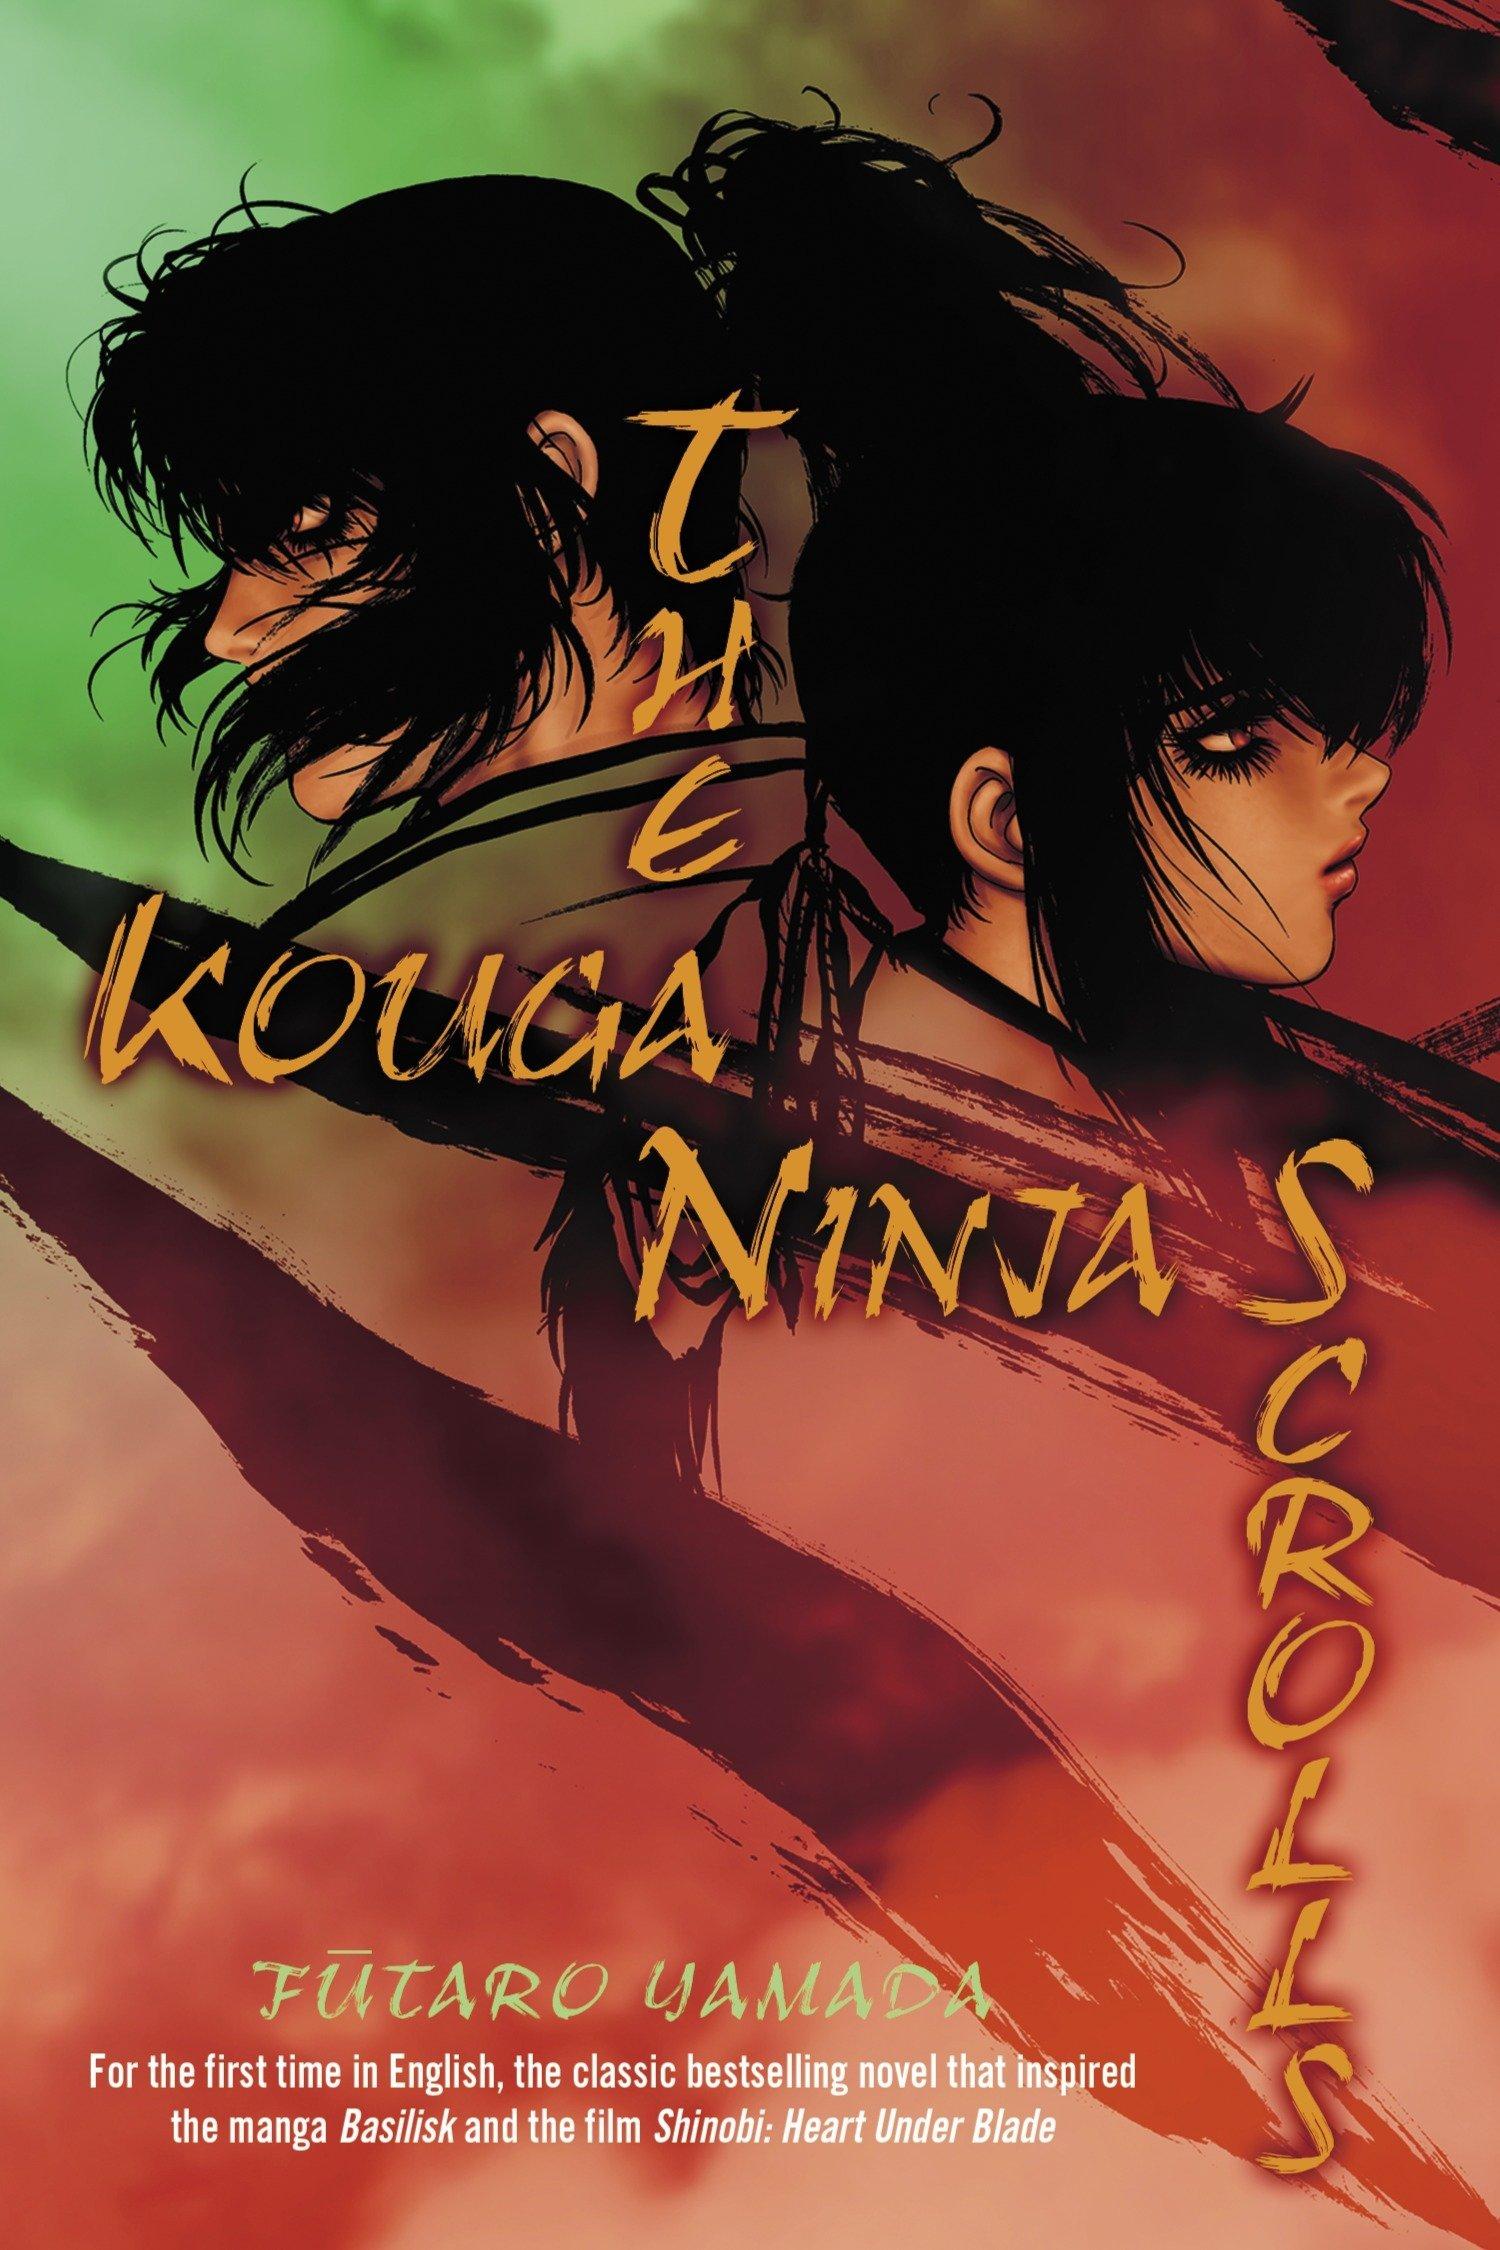 The Kouga Ninja Scrolls: A Novel: Futaro Yamada, Geoff Sant ...